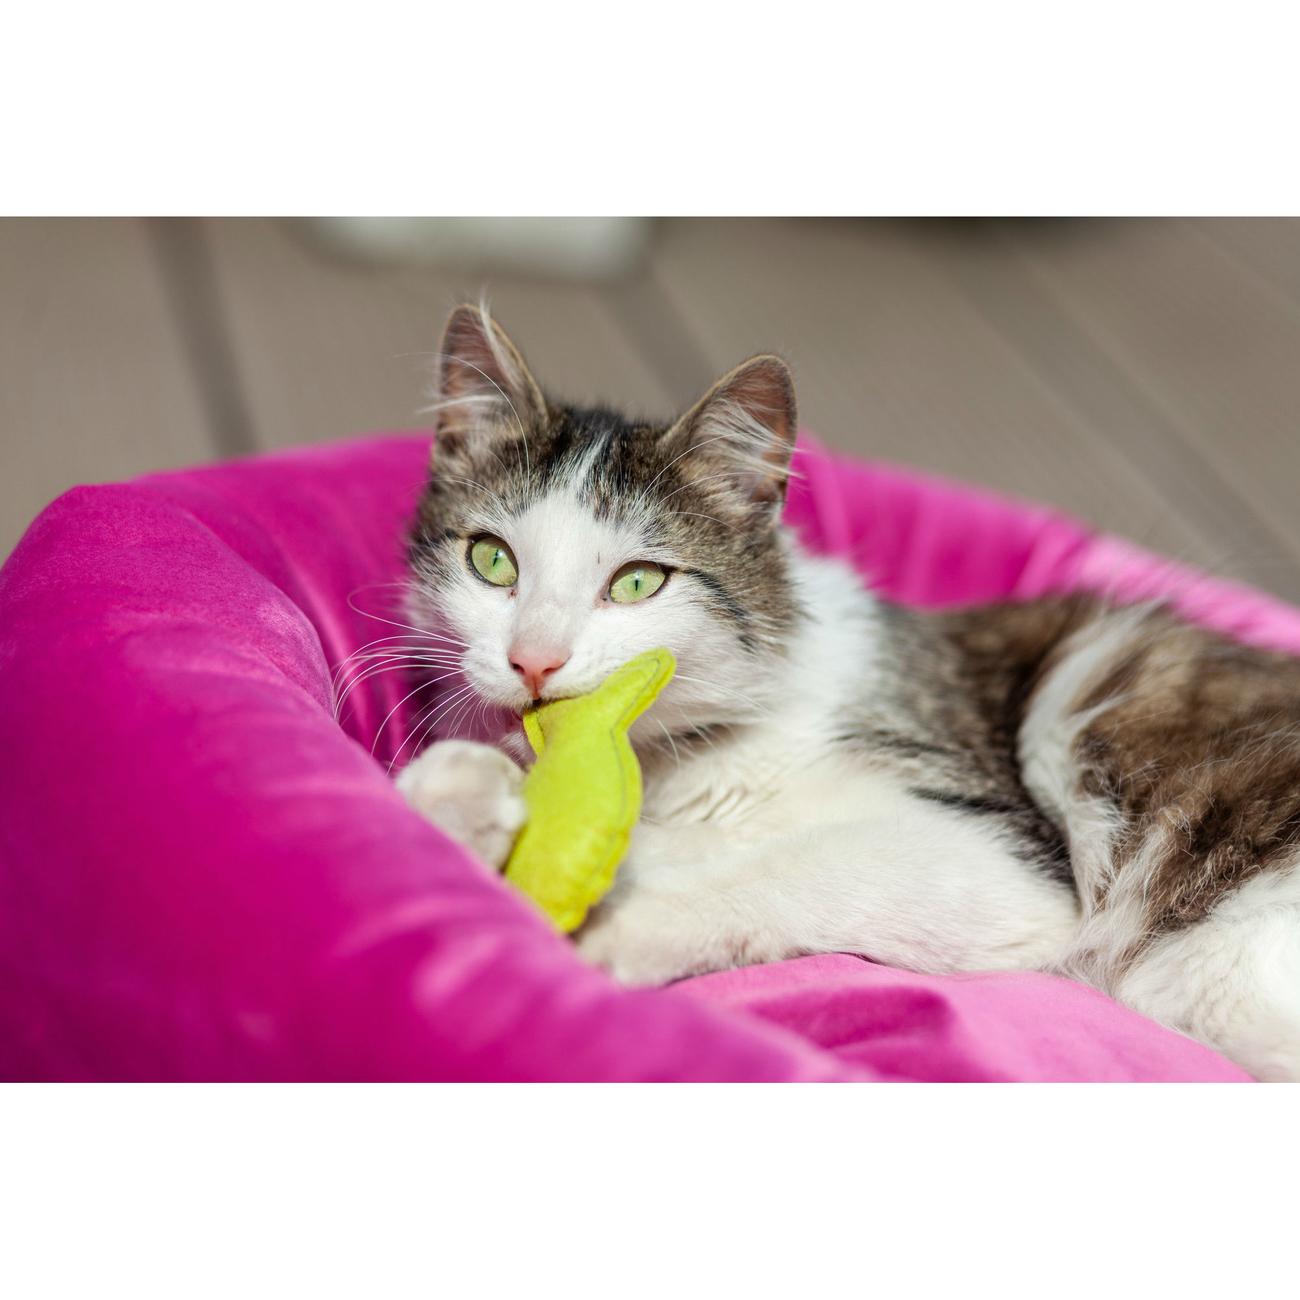 Hunter Katzenspielzeug by Laura 65902, Bild 4